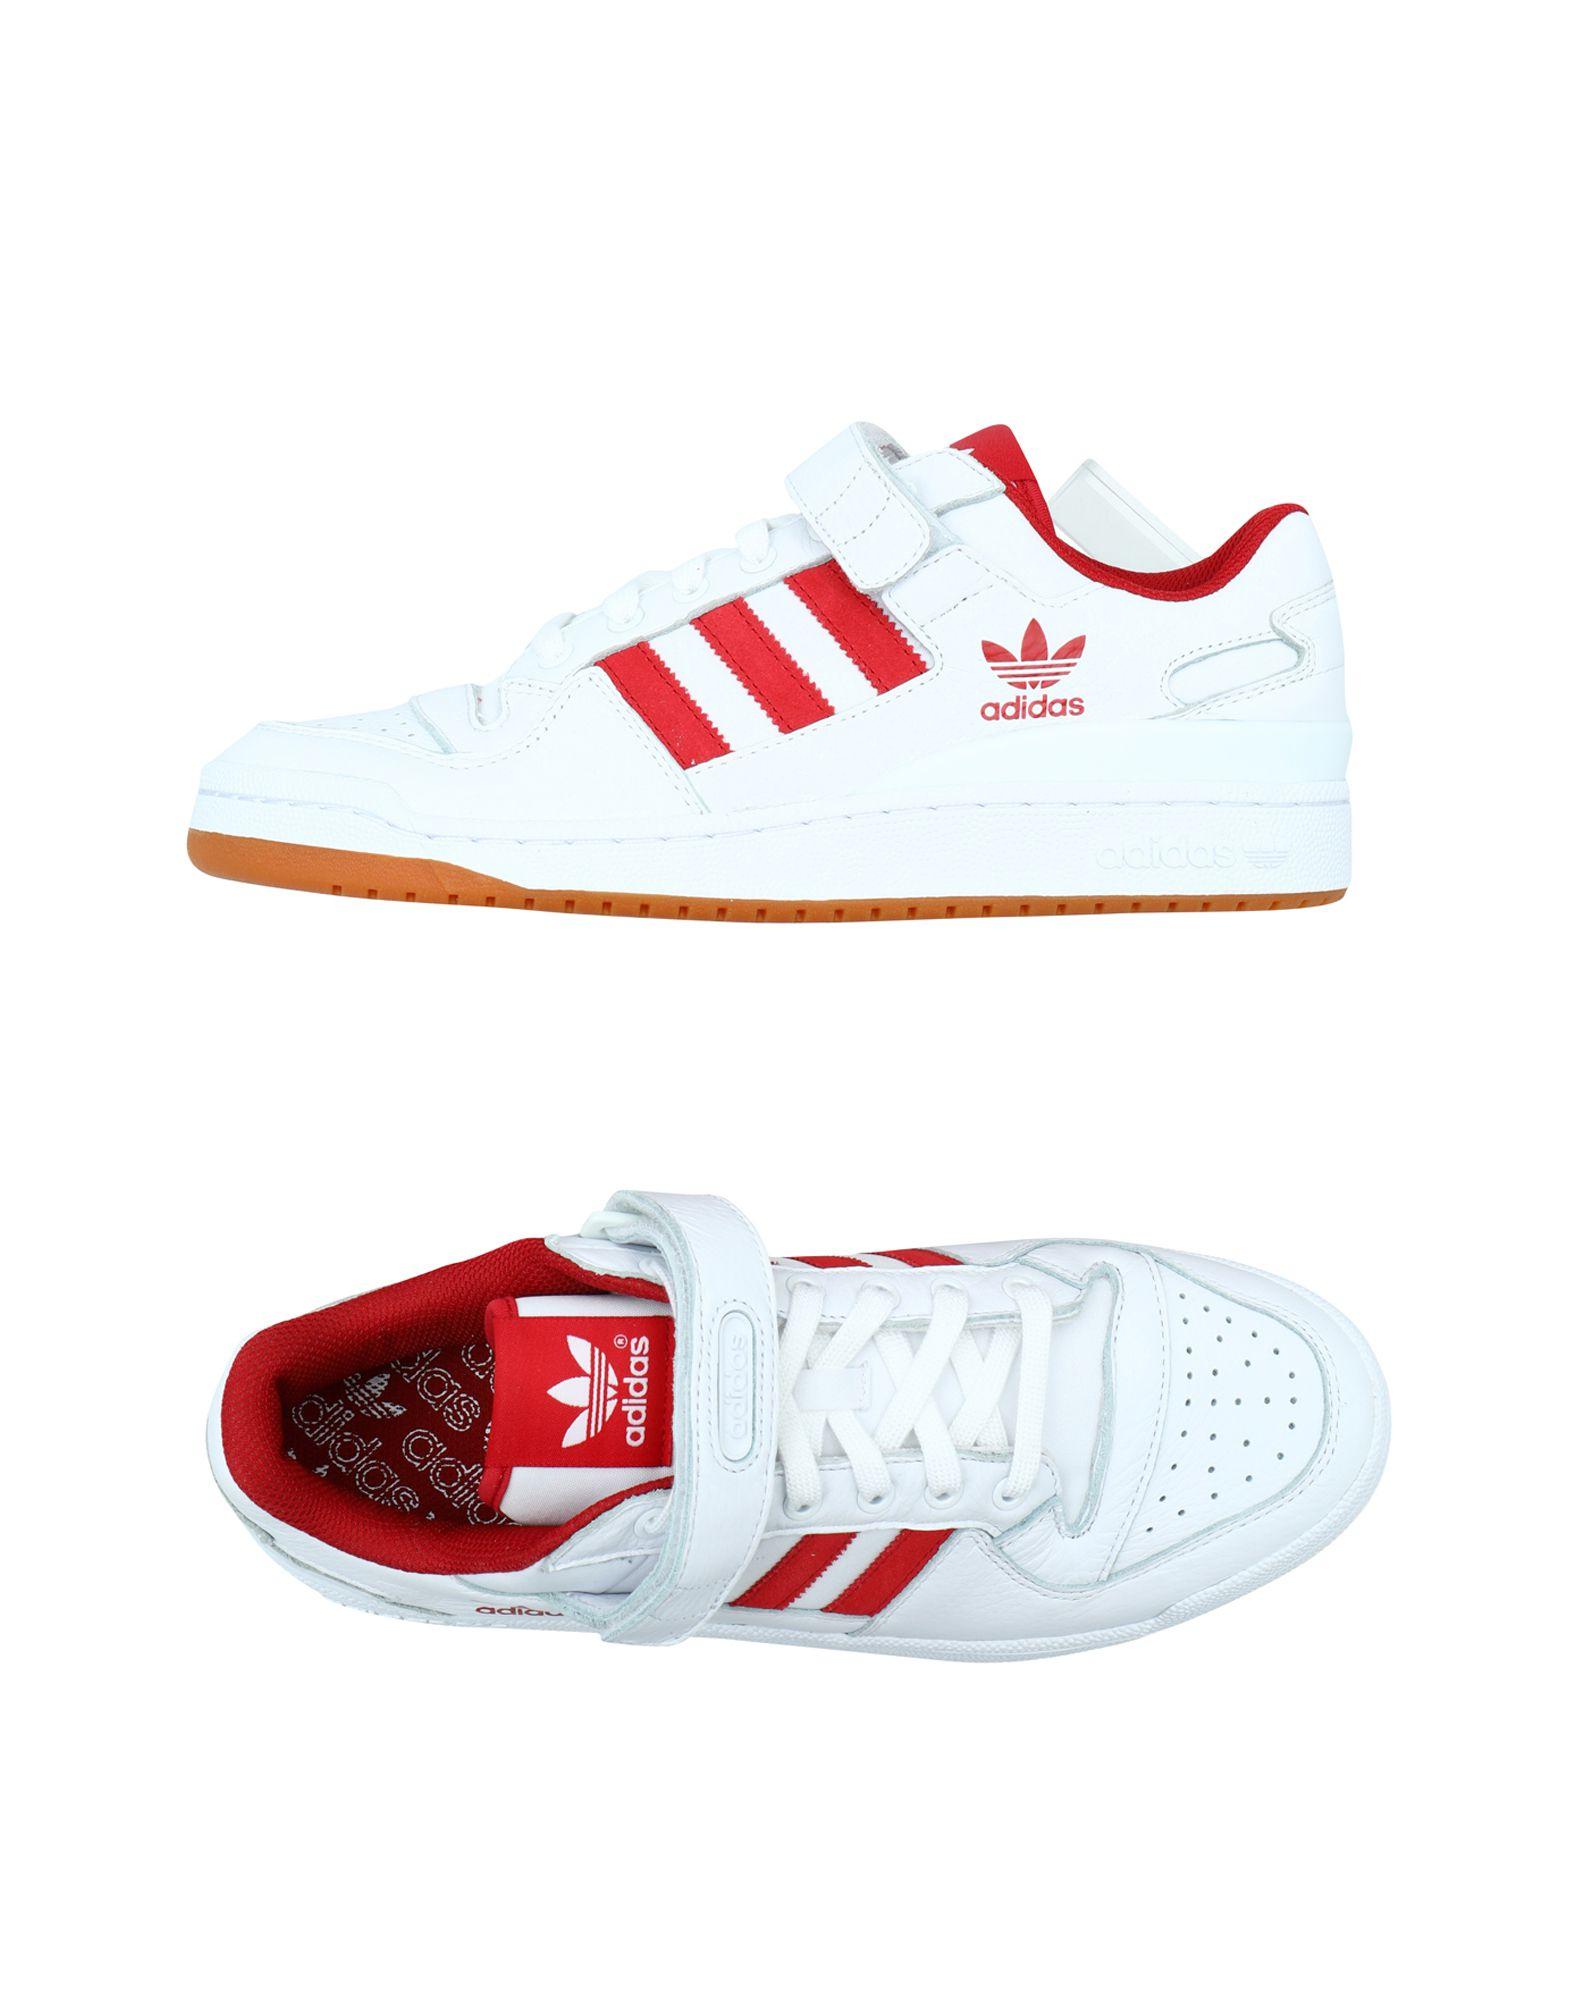 Sneakers Adidas - Originals Forum Lo - Adidas Uomo - 11533557JB 8a5da2